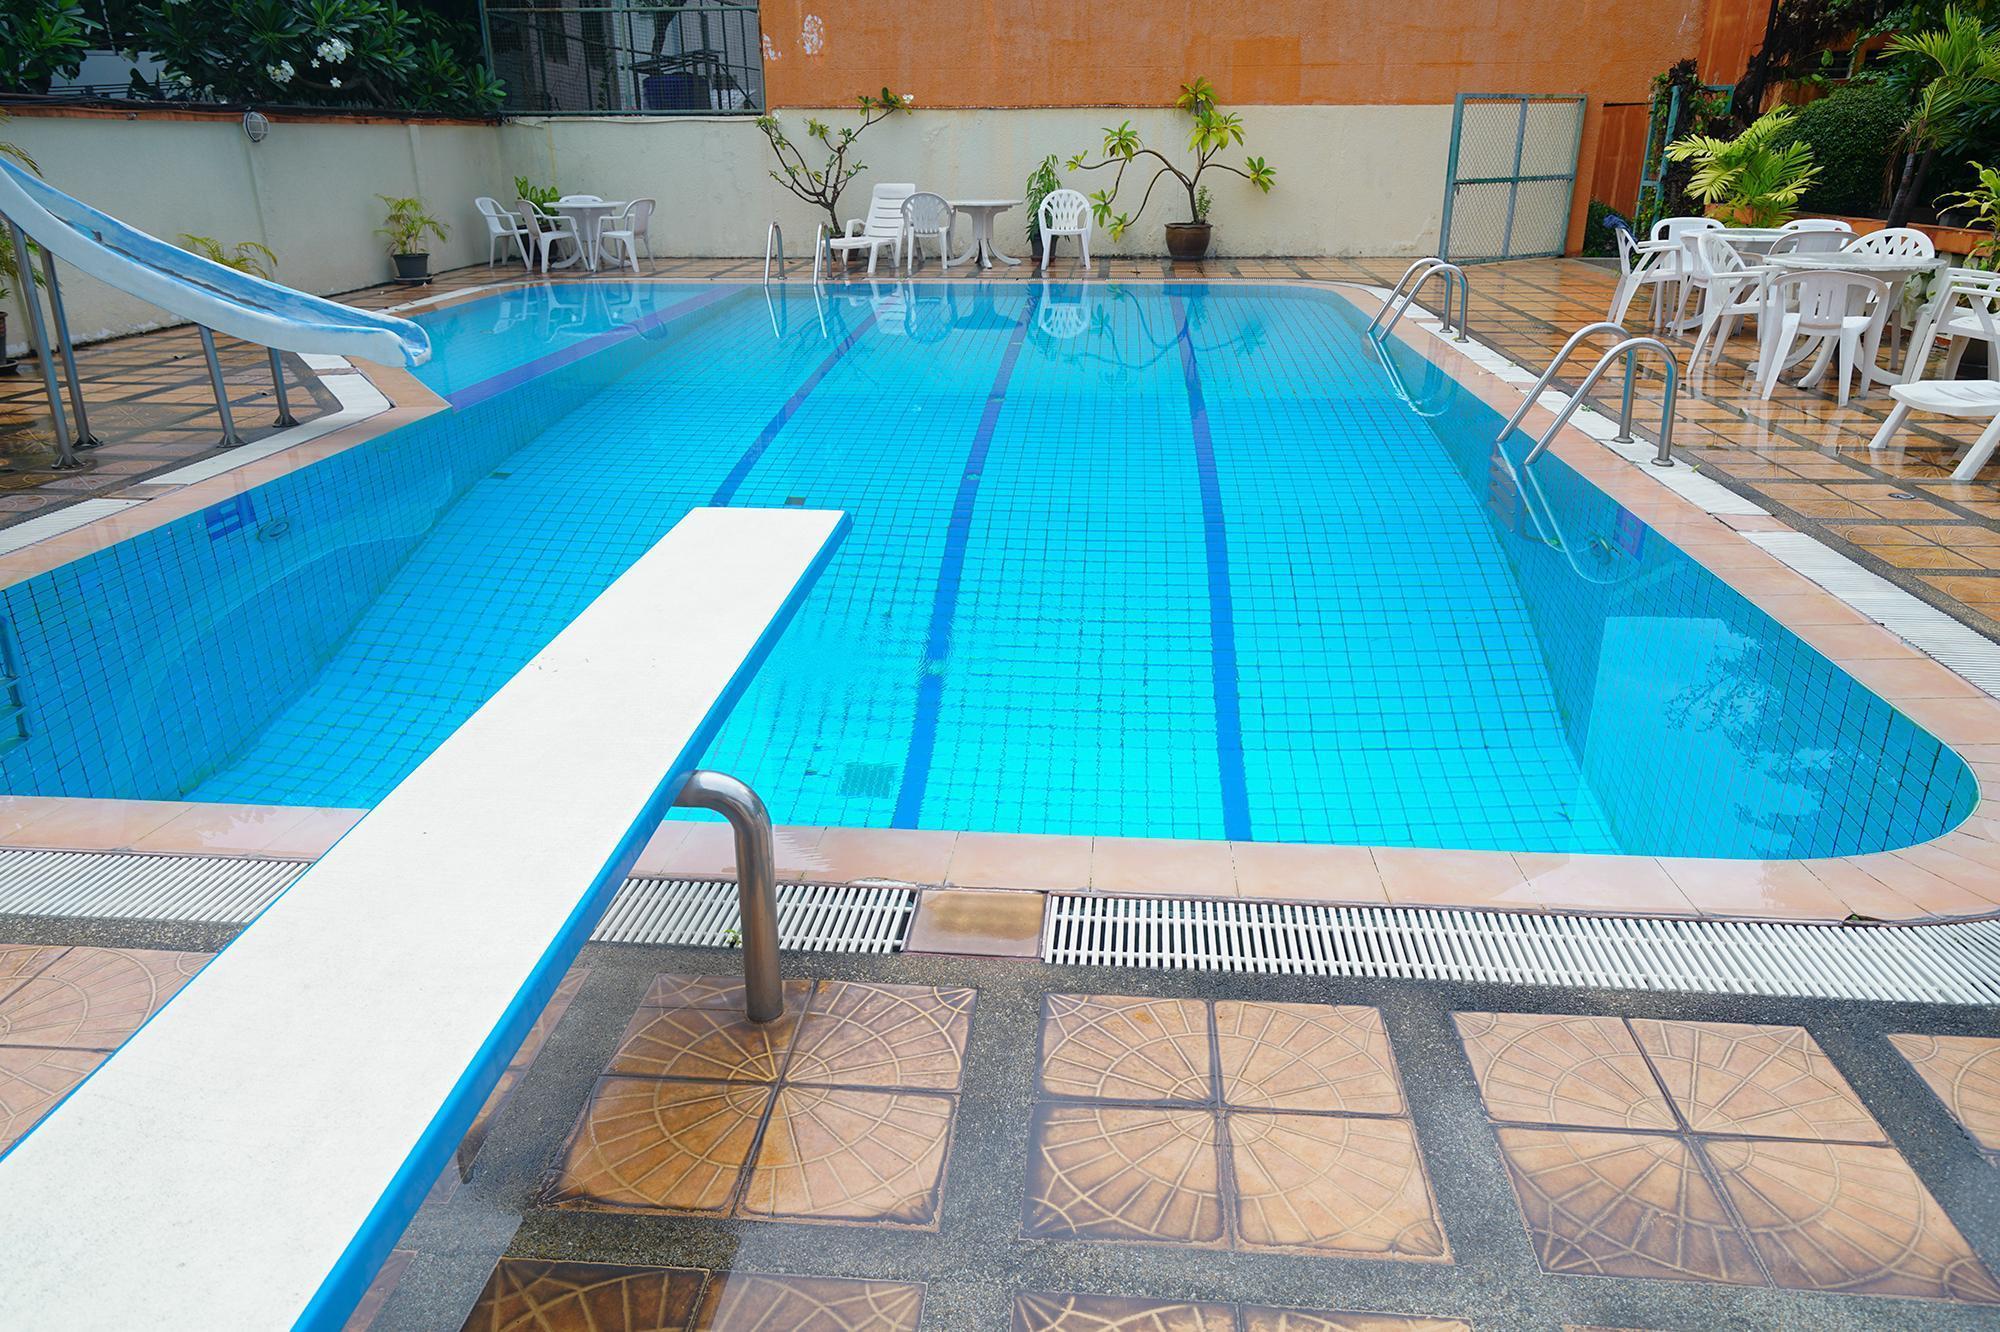 sukhumvit 31 villa pool kitchen Dormitory room สตูดิโอ วิลลา 0 ห้องน้ำส่วนตัว ขนาด 400 ตร.ม. – สุขุมวิท